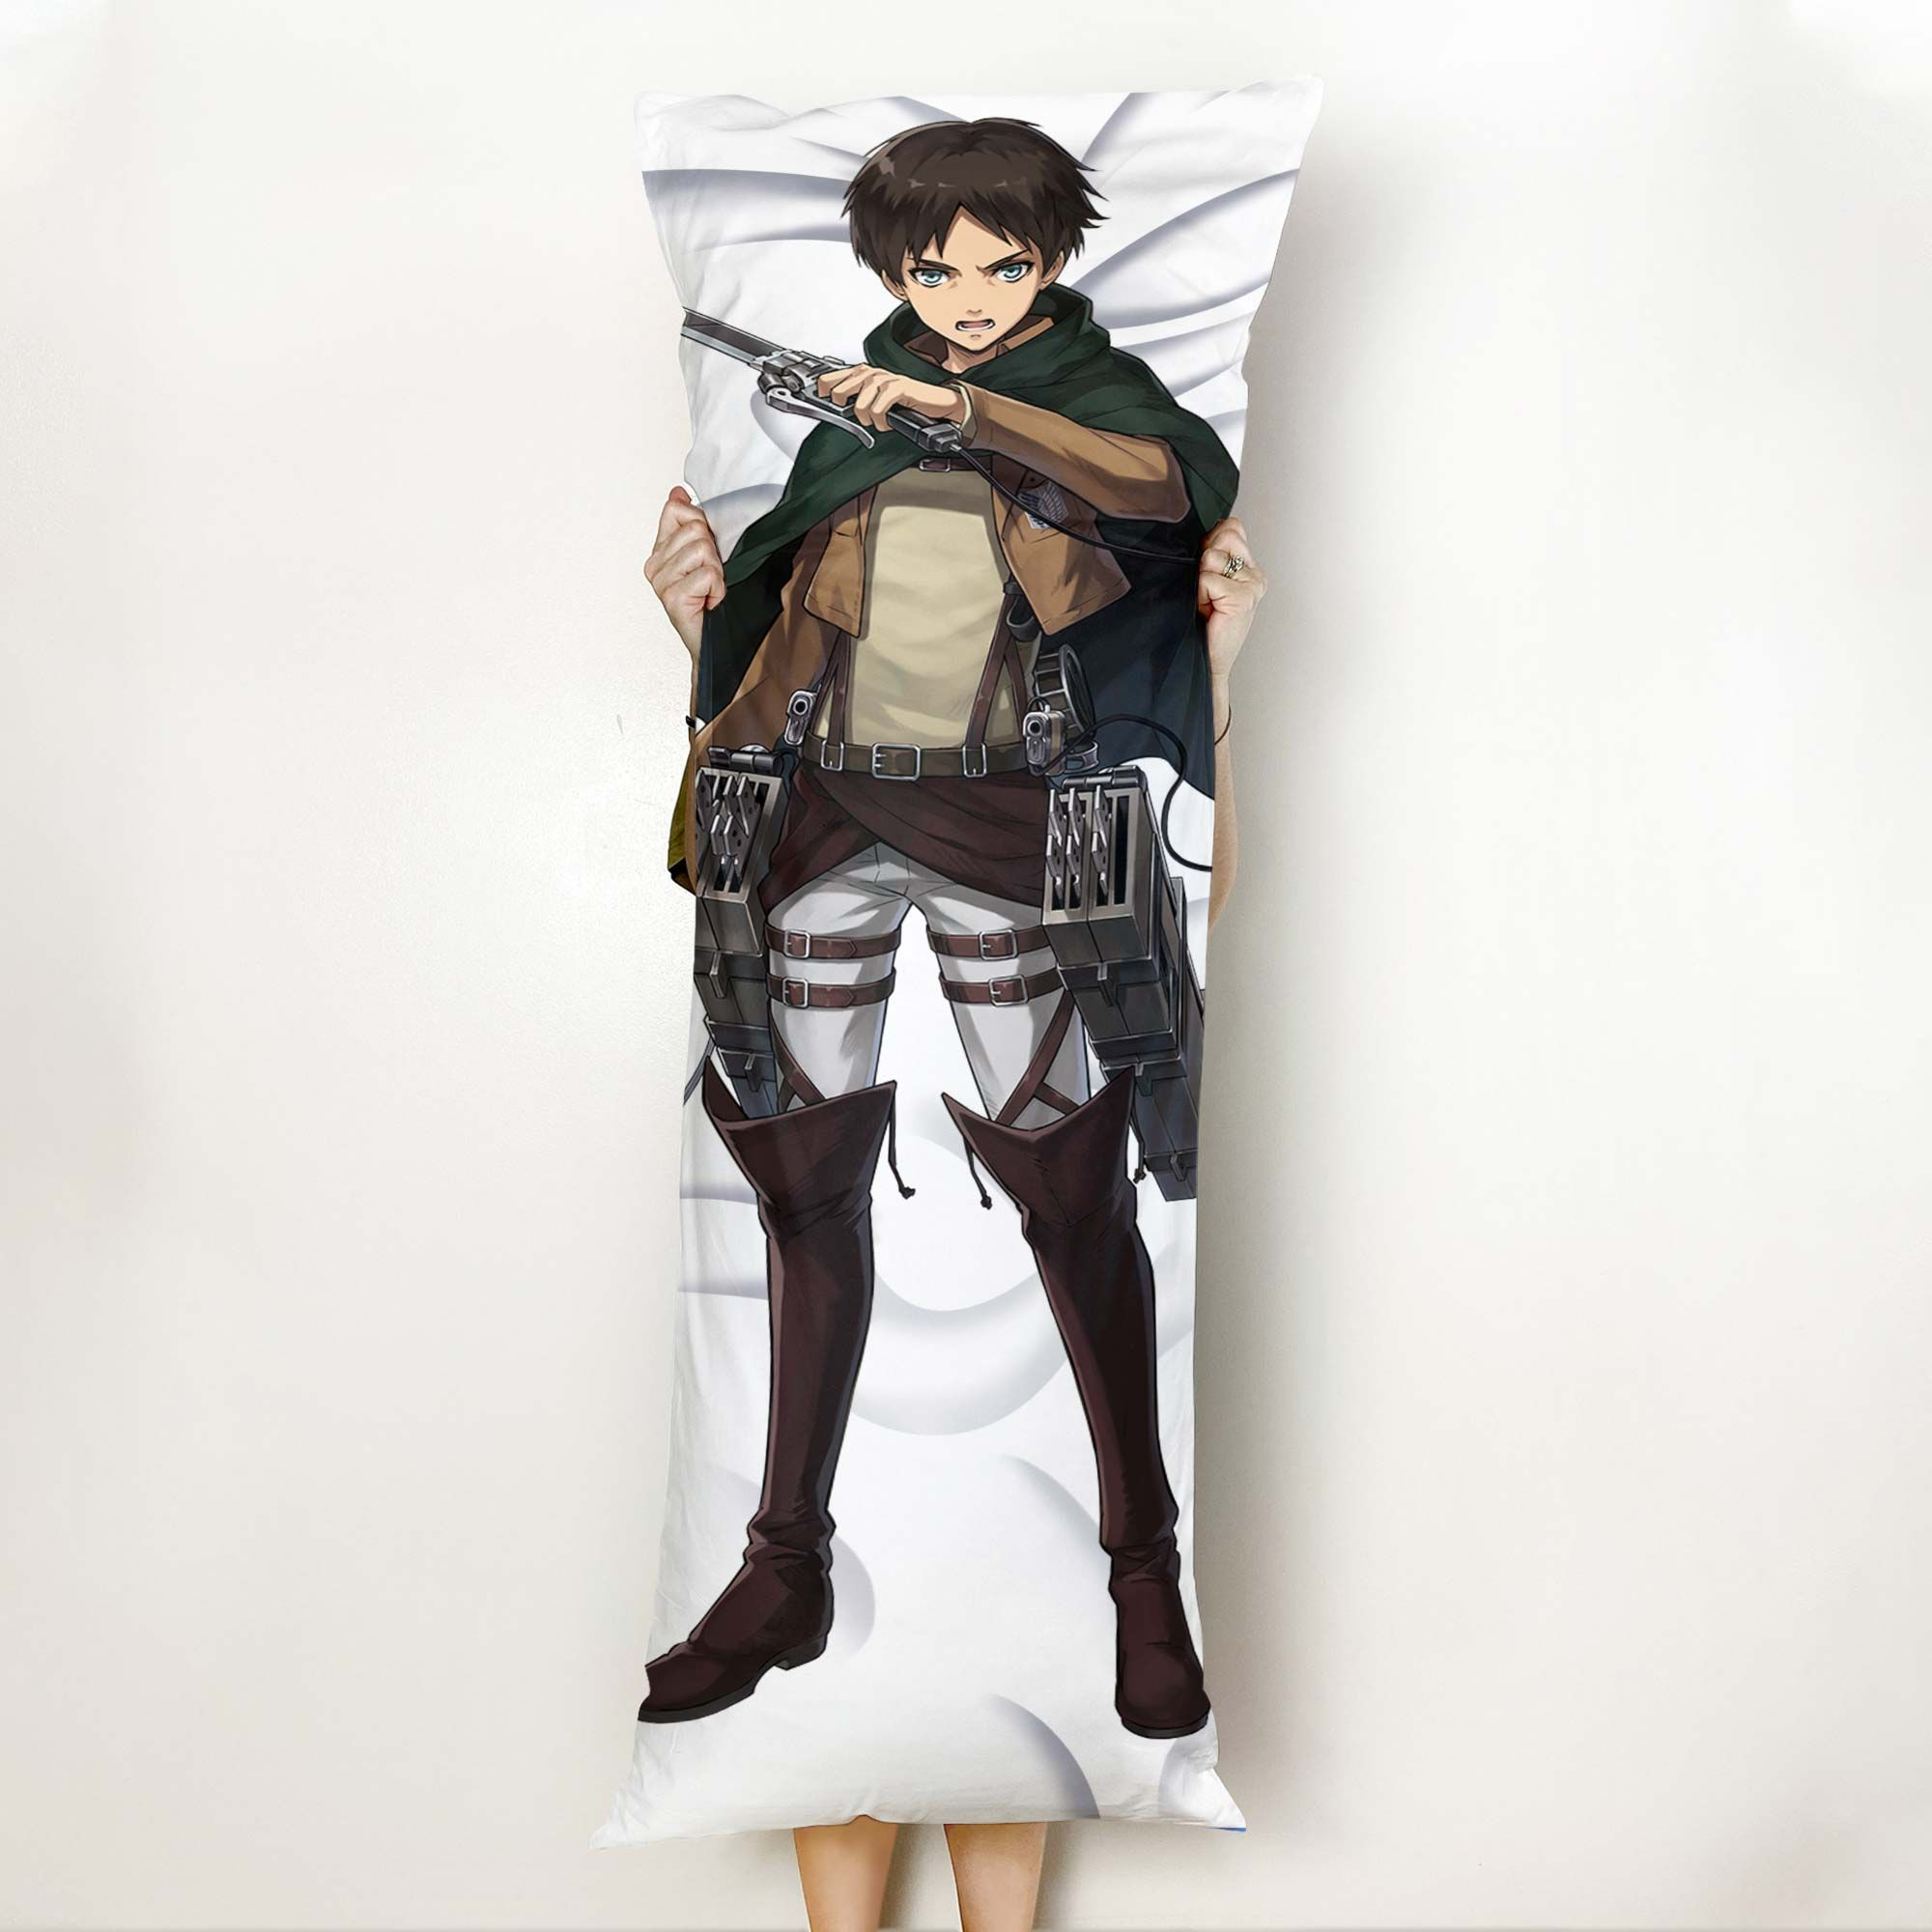 Eren Jaeger Body Pillow Cover Custom Attack On Titan Anime Gifts Official Merch GO0110